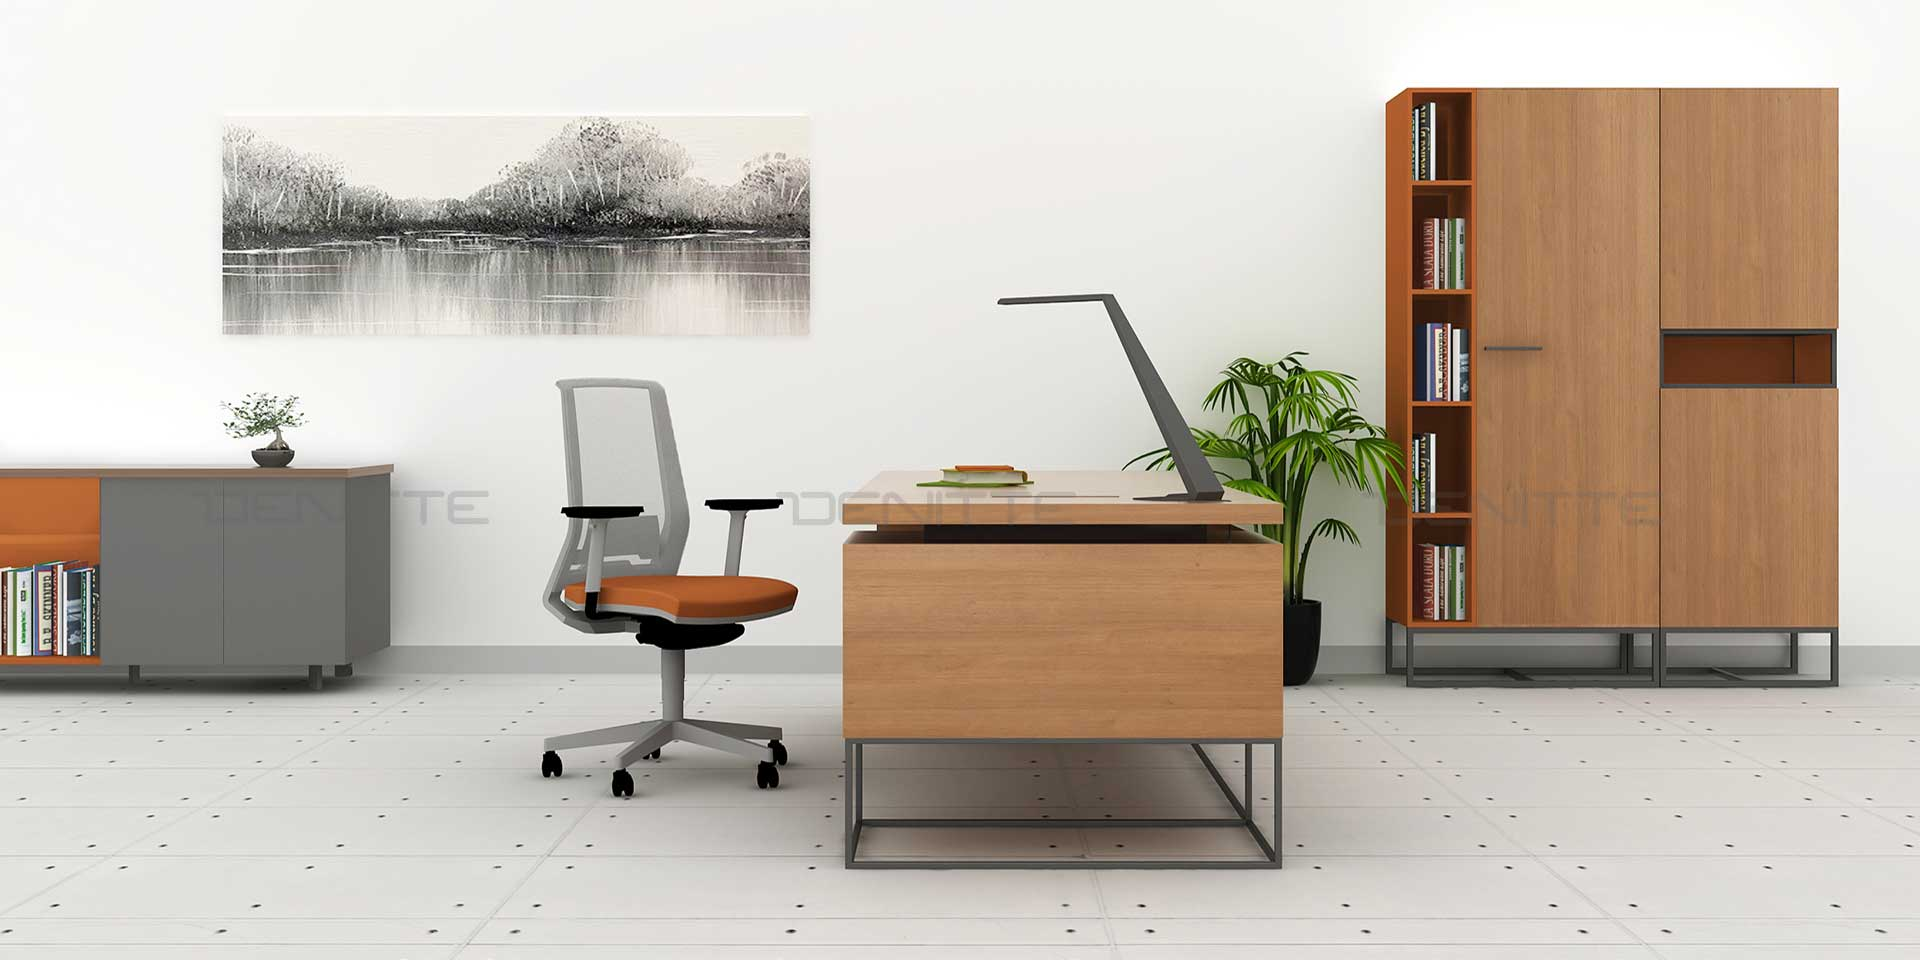 صندلی کارمندی و صندلی مدیریتی D750